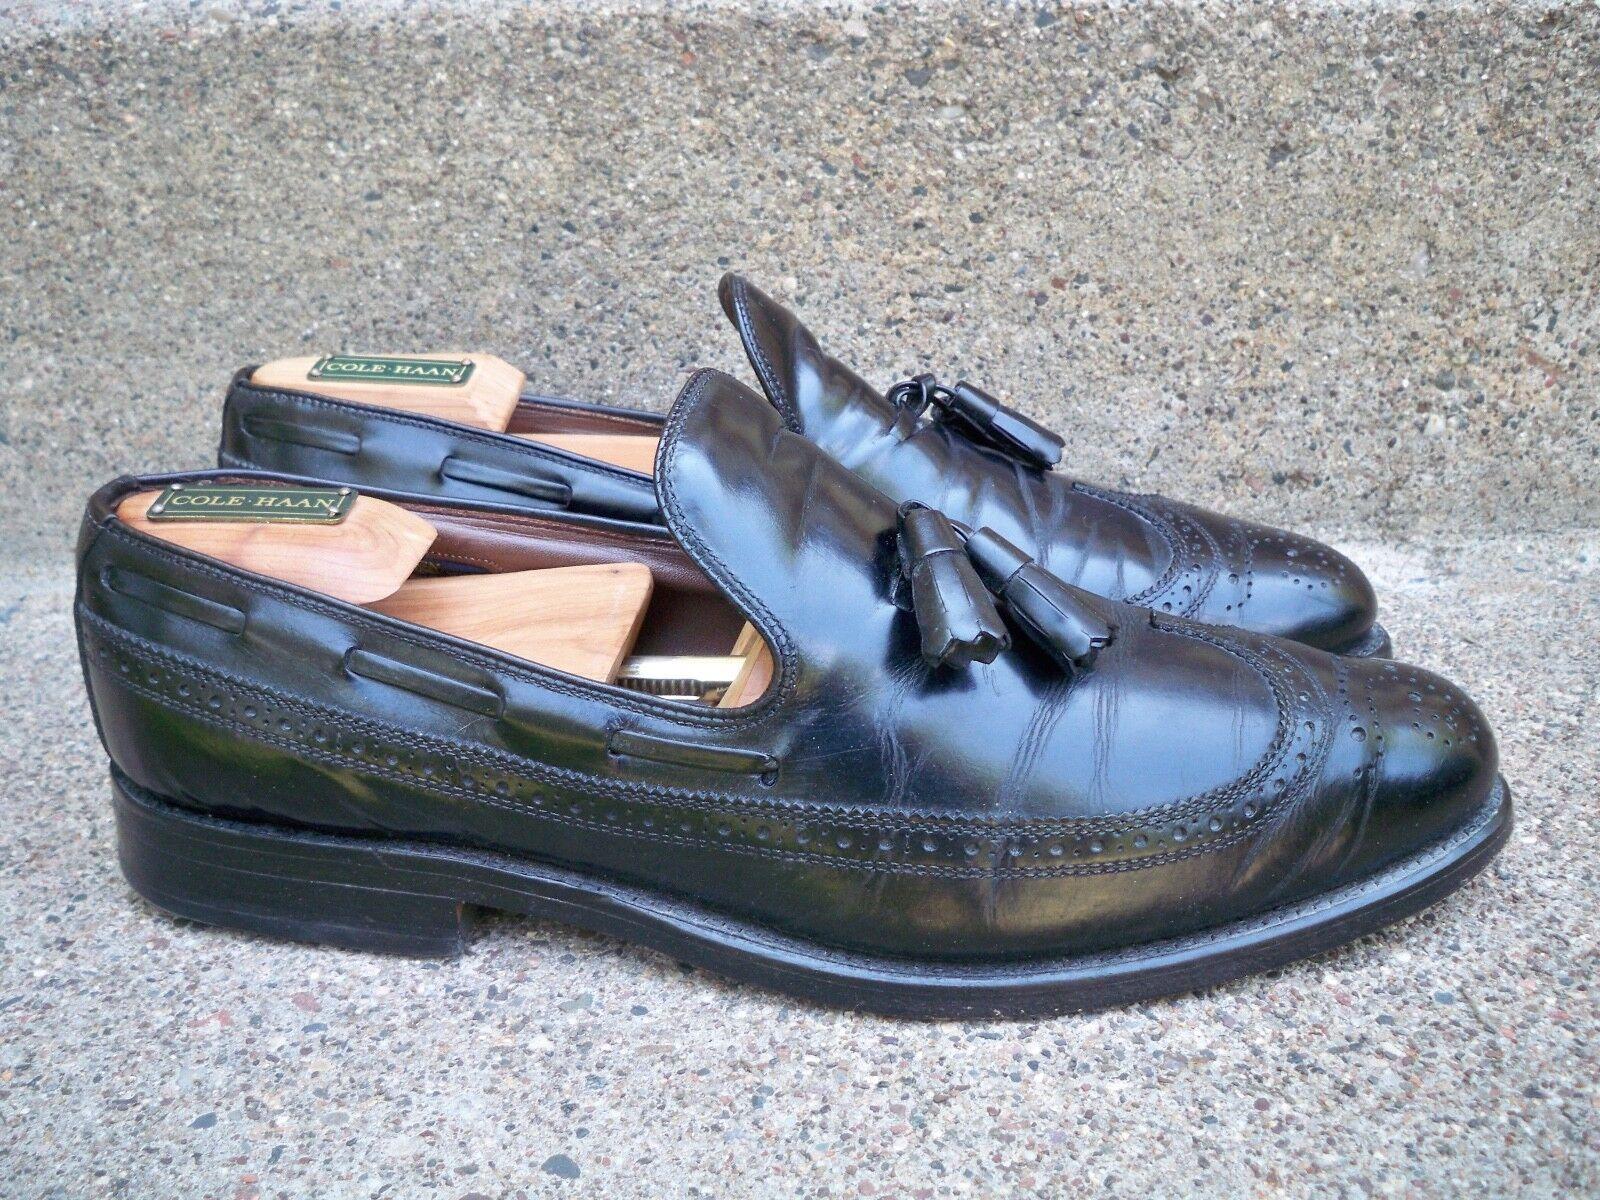 memorizzare Vintage Vintage Vintage Allen Edmonds  Berwick  Penny Leather Slipon Loafer scarpe Uomo Dimensione 10  ecco l'ultimo